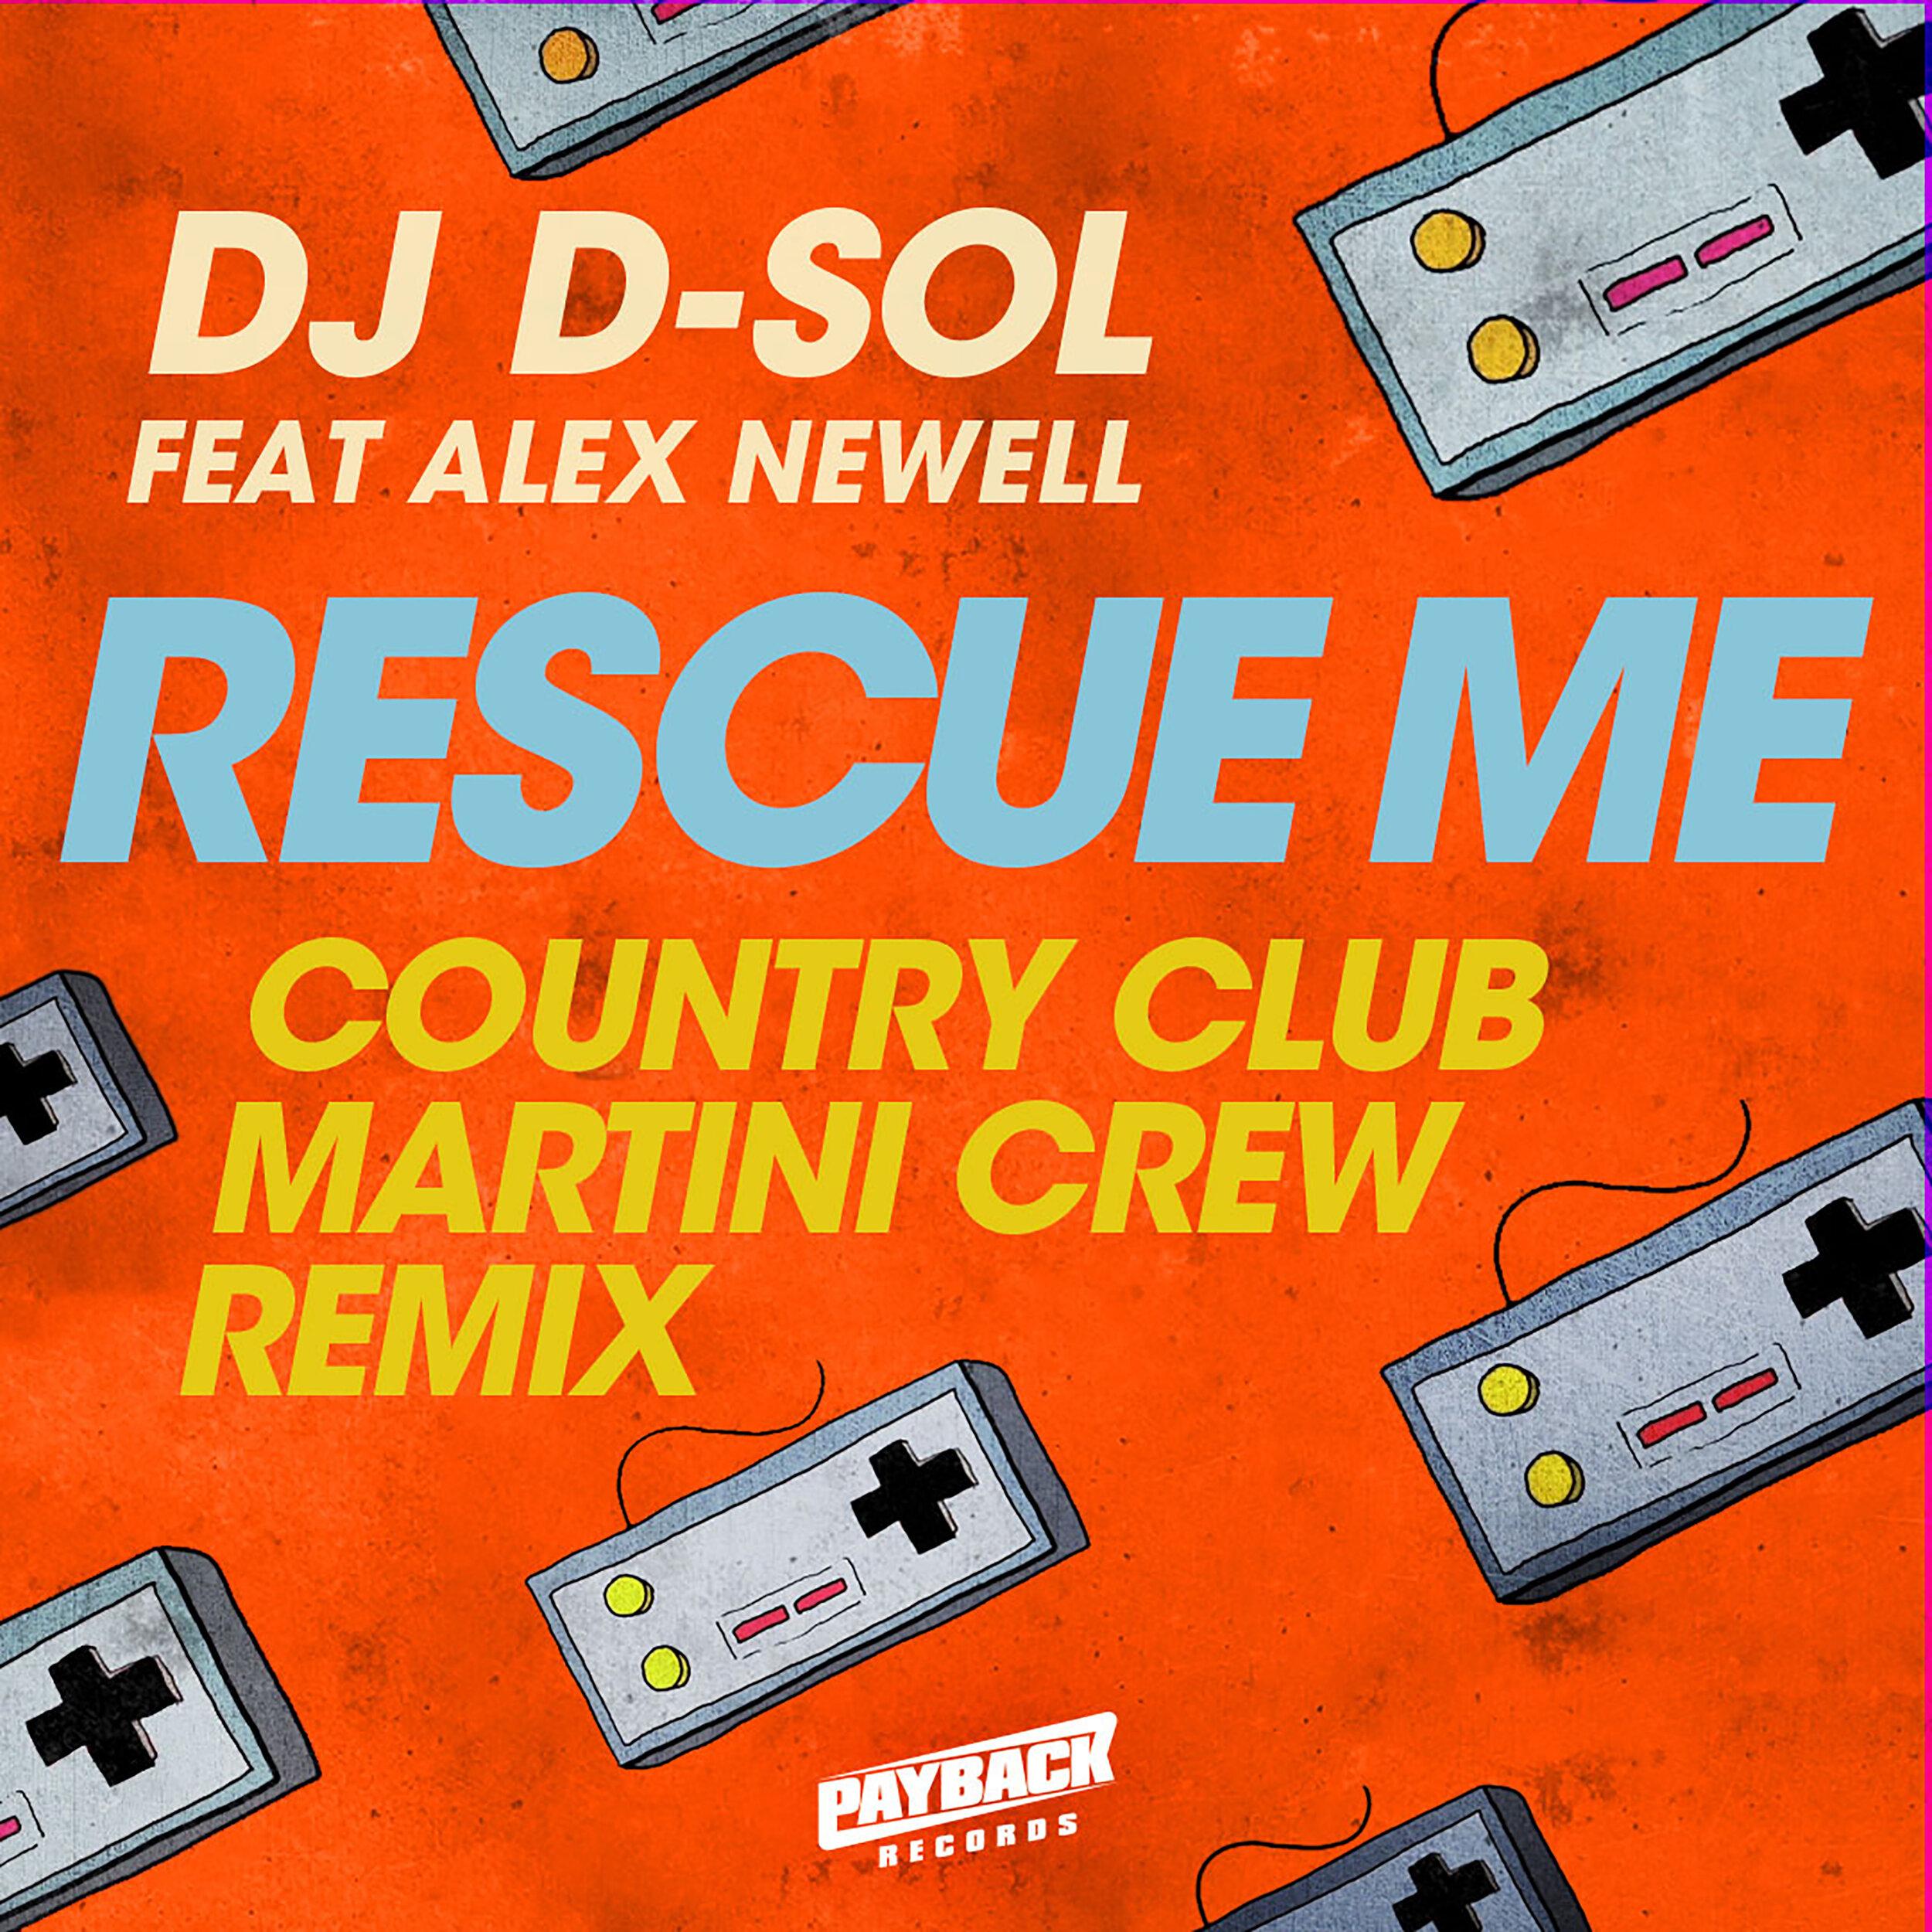 D-Sol_Rescue-Me_REMIX_Country-Club-Martini-Crew_3K.jpg